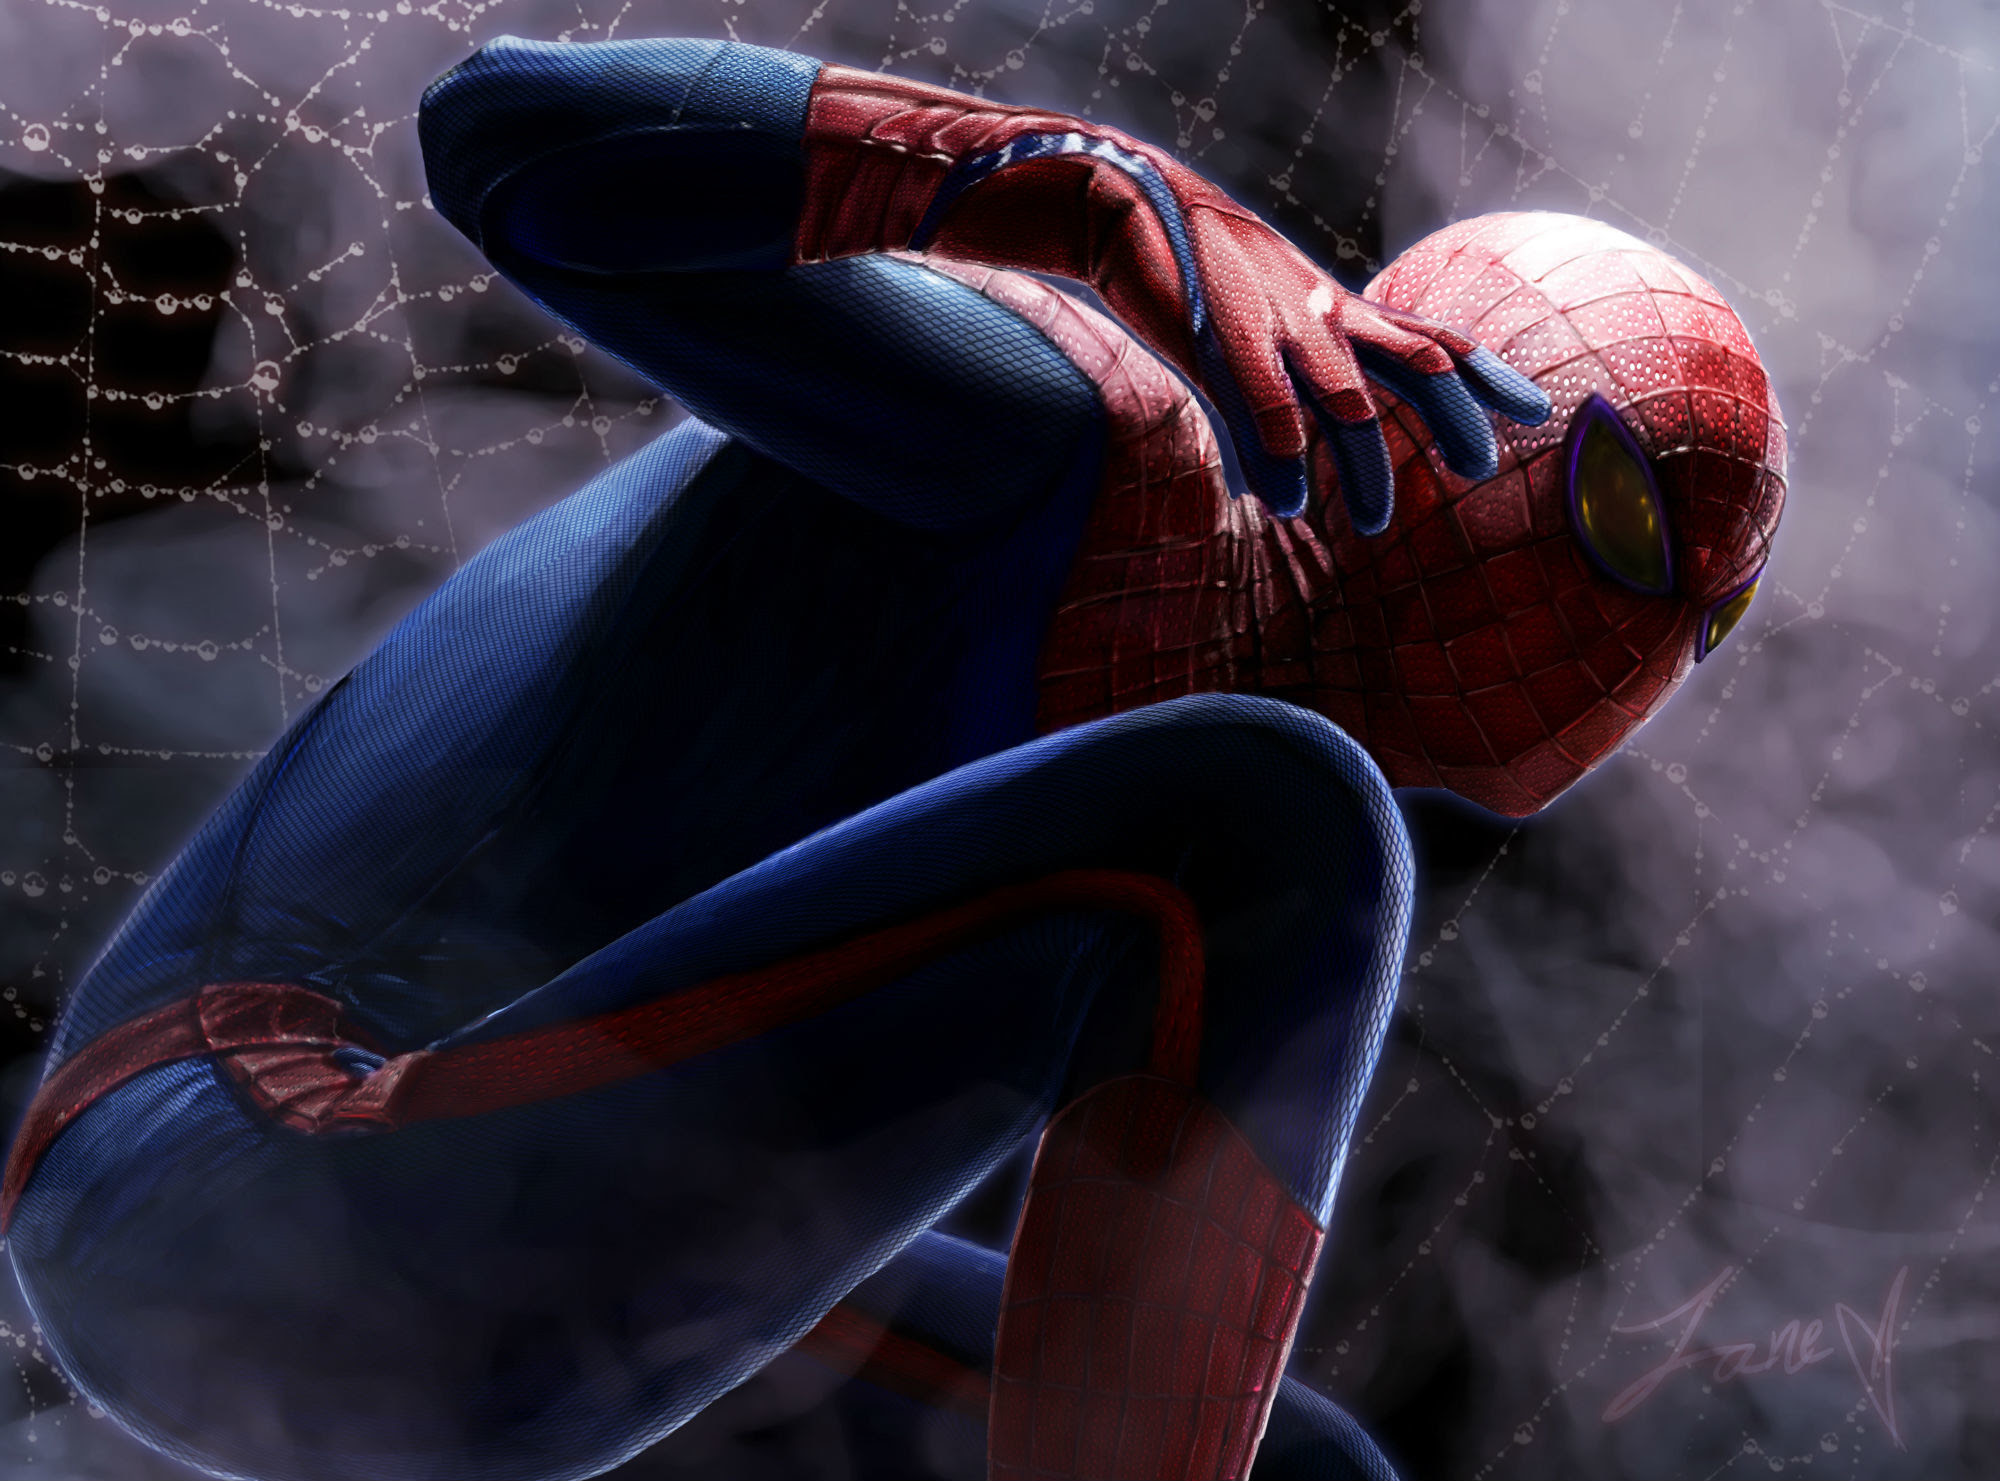 Spider Man Ps4 Hd Wallpaper